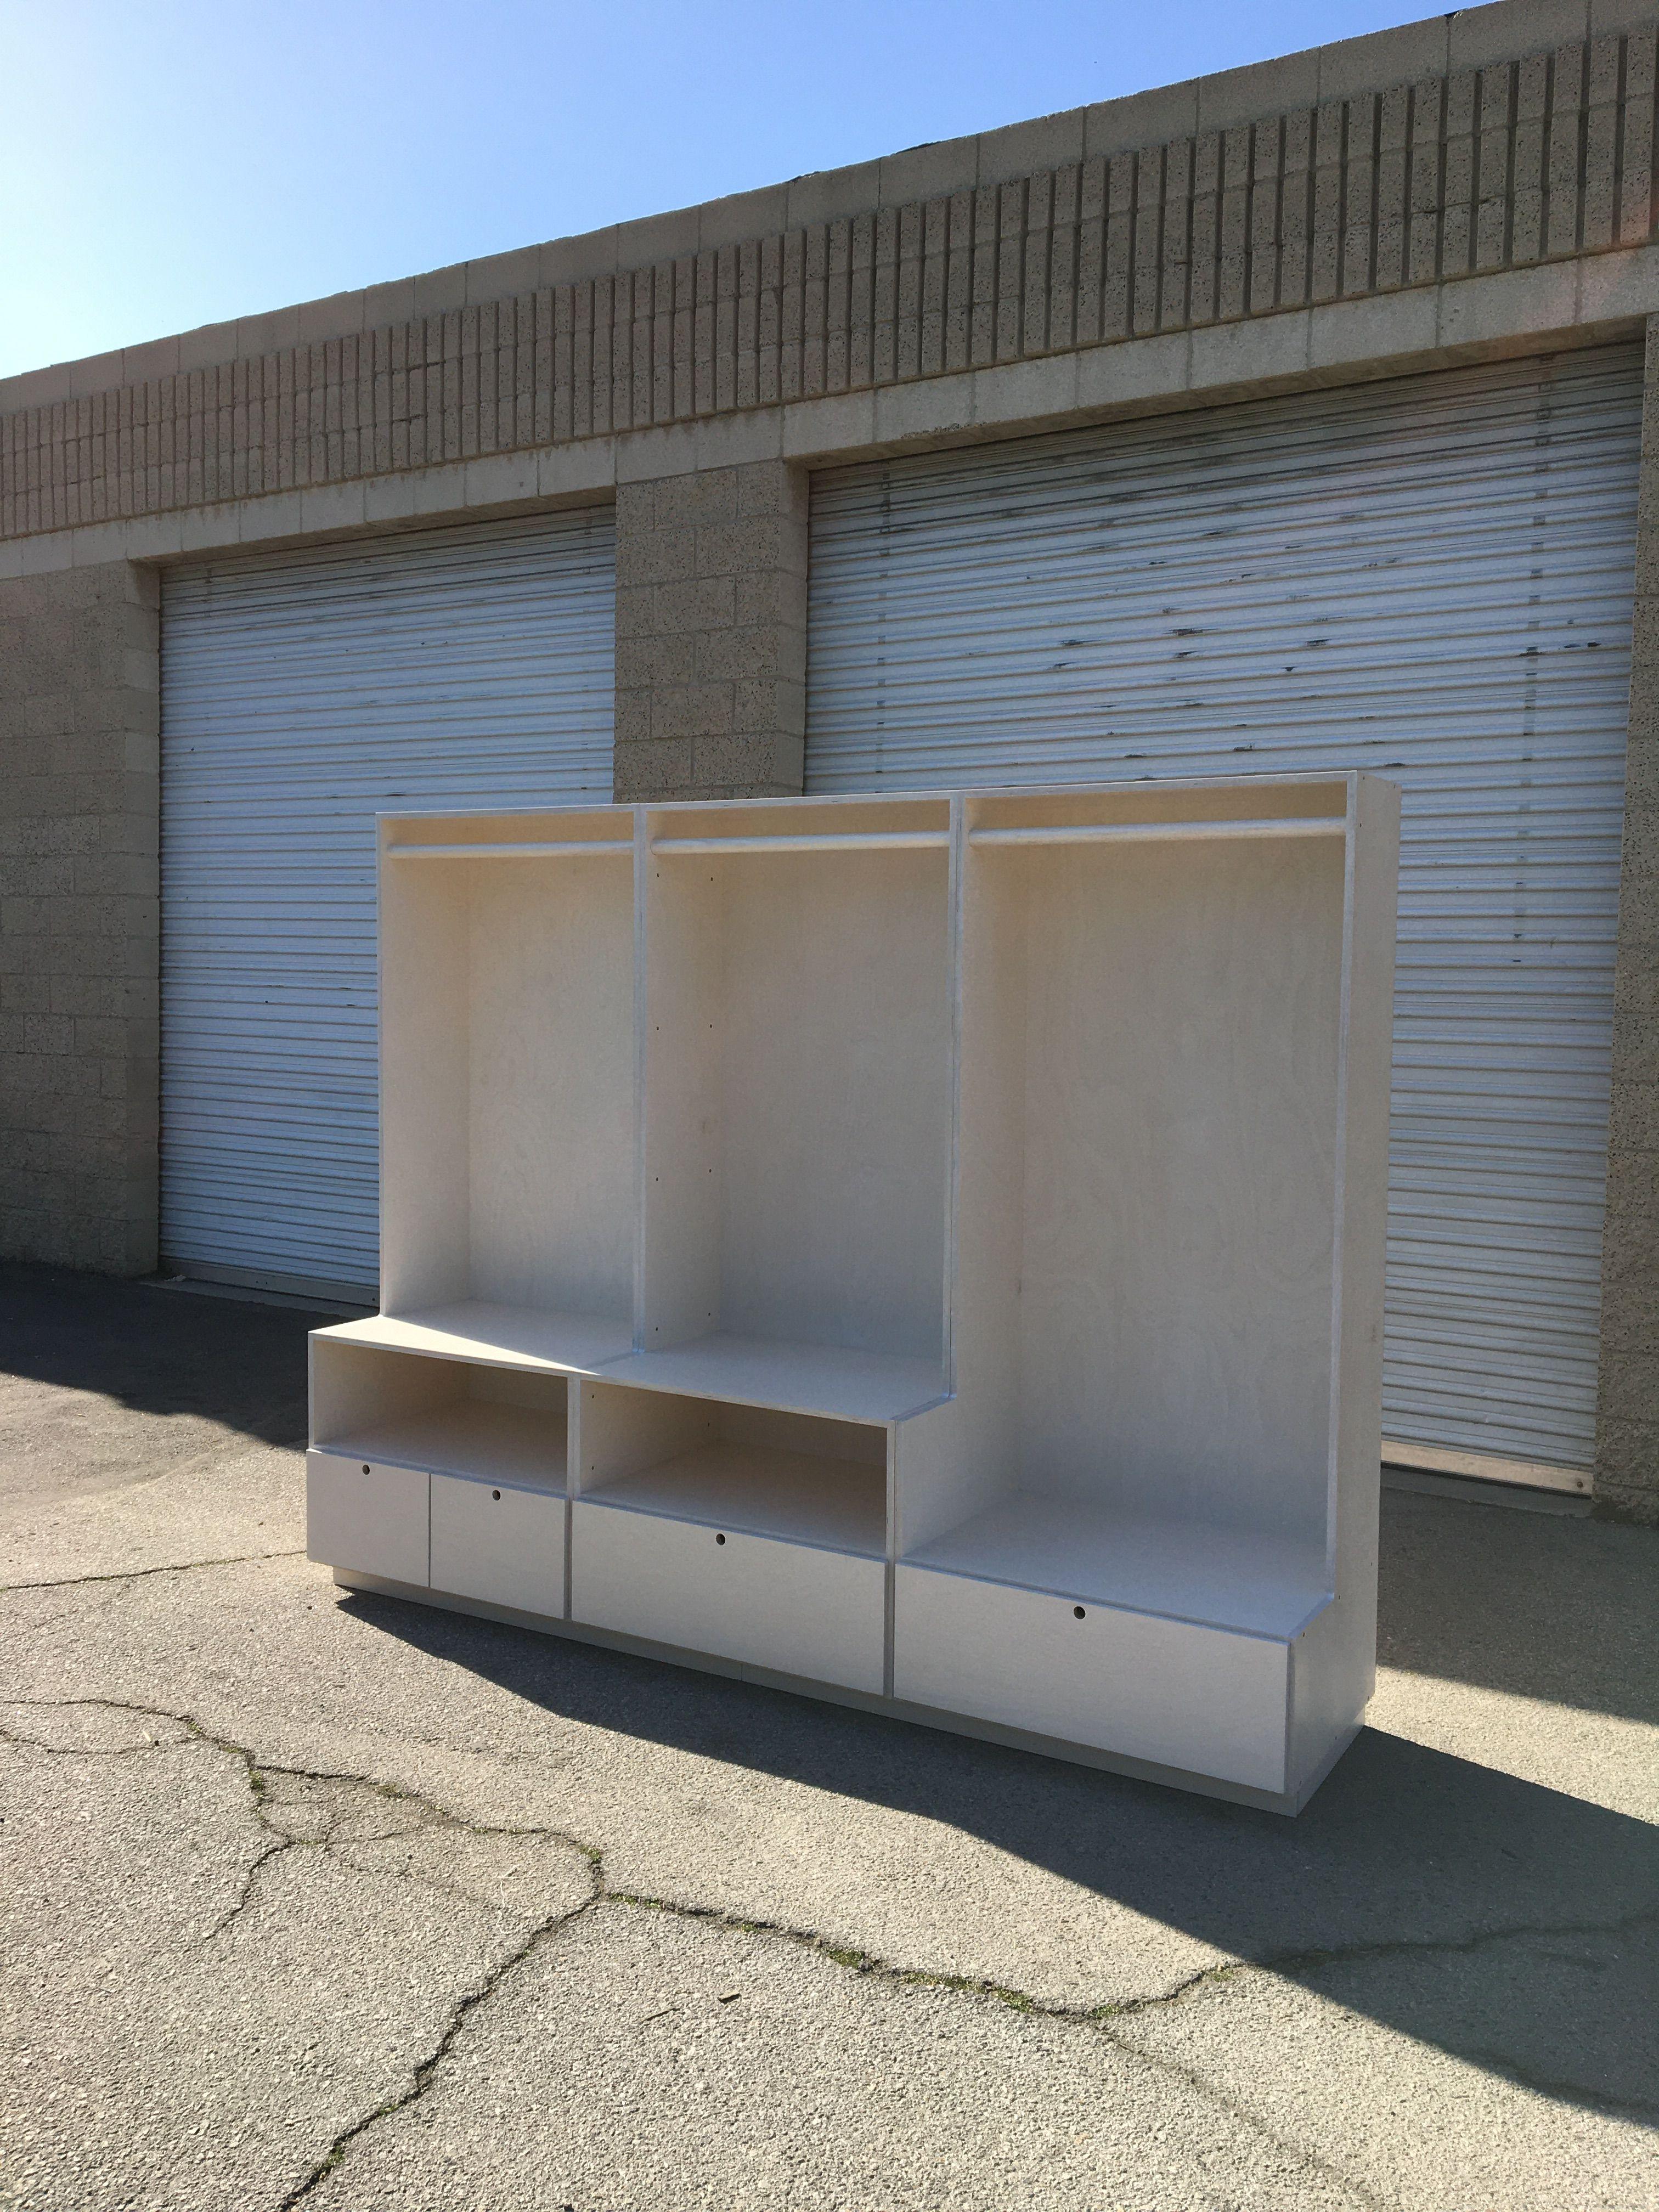 Three Section Closet product image 1